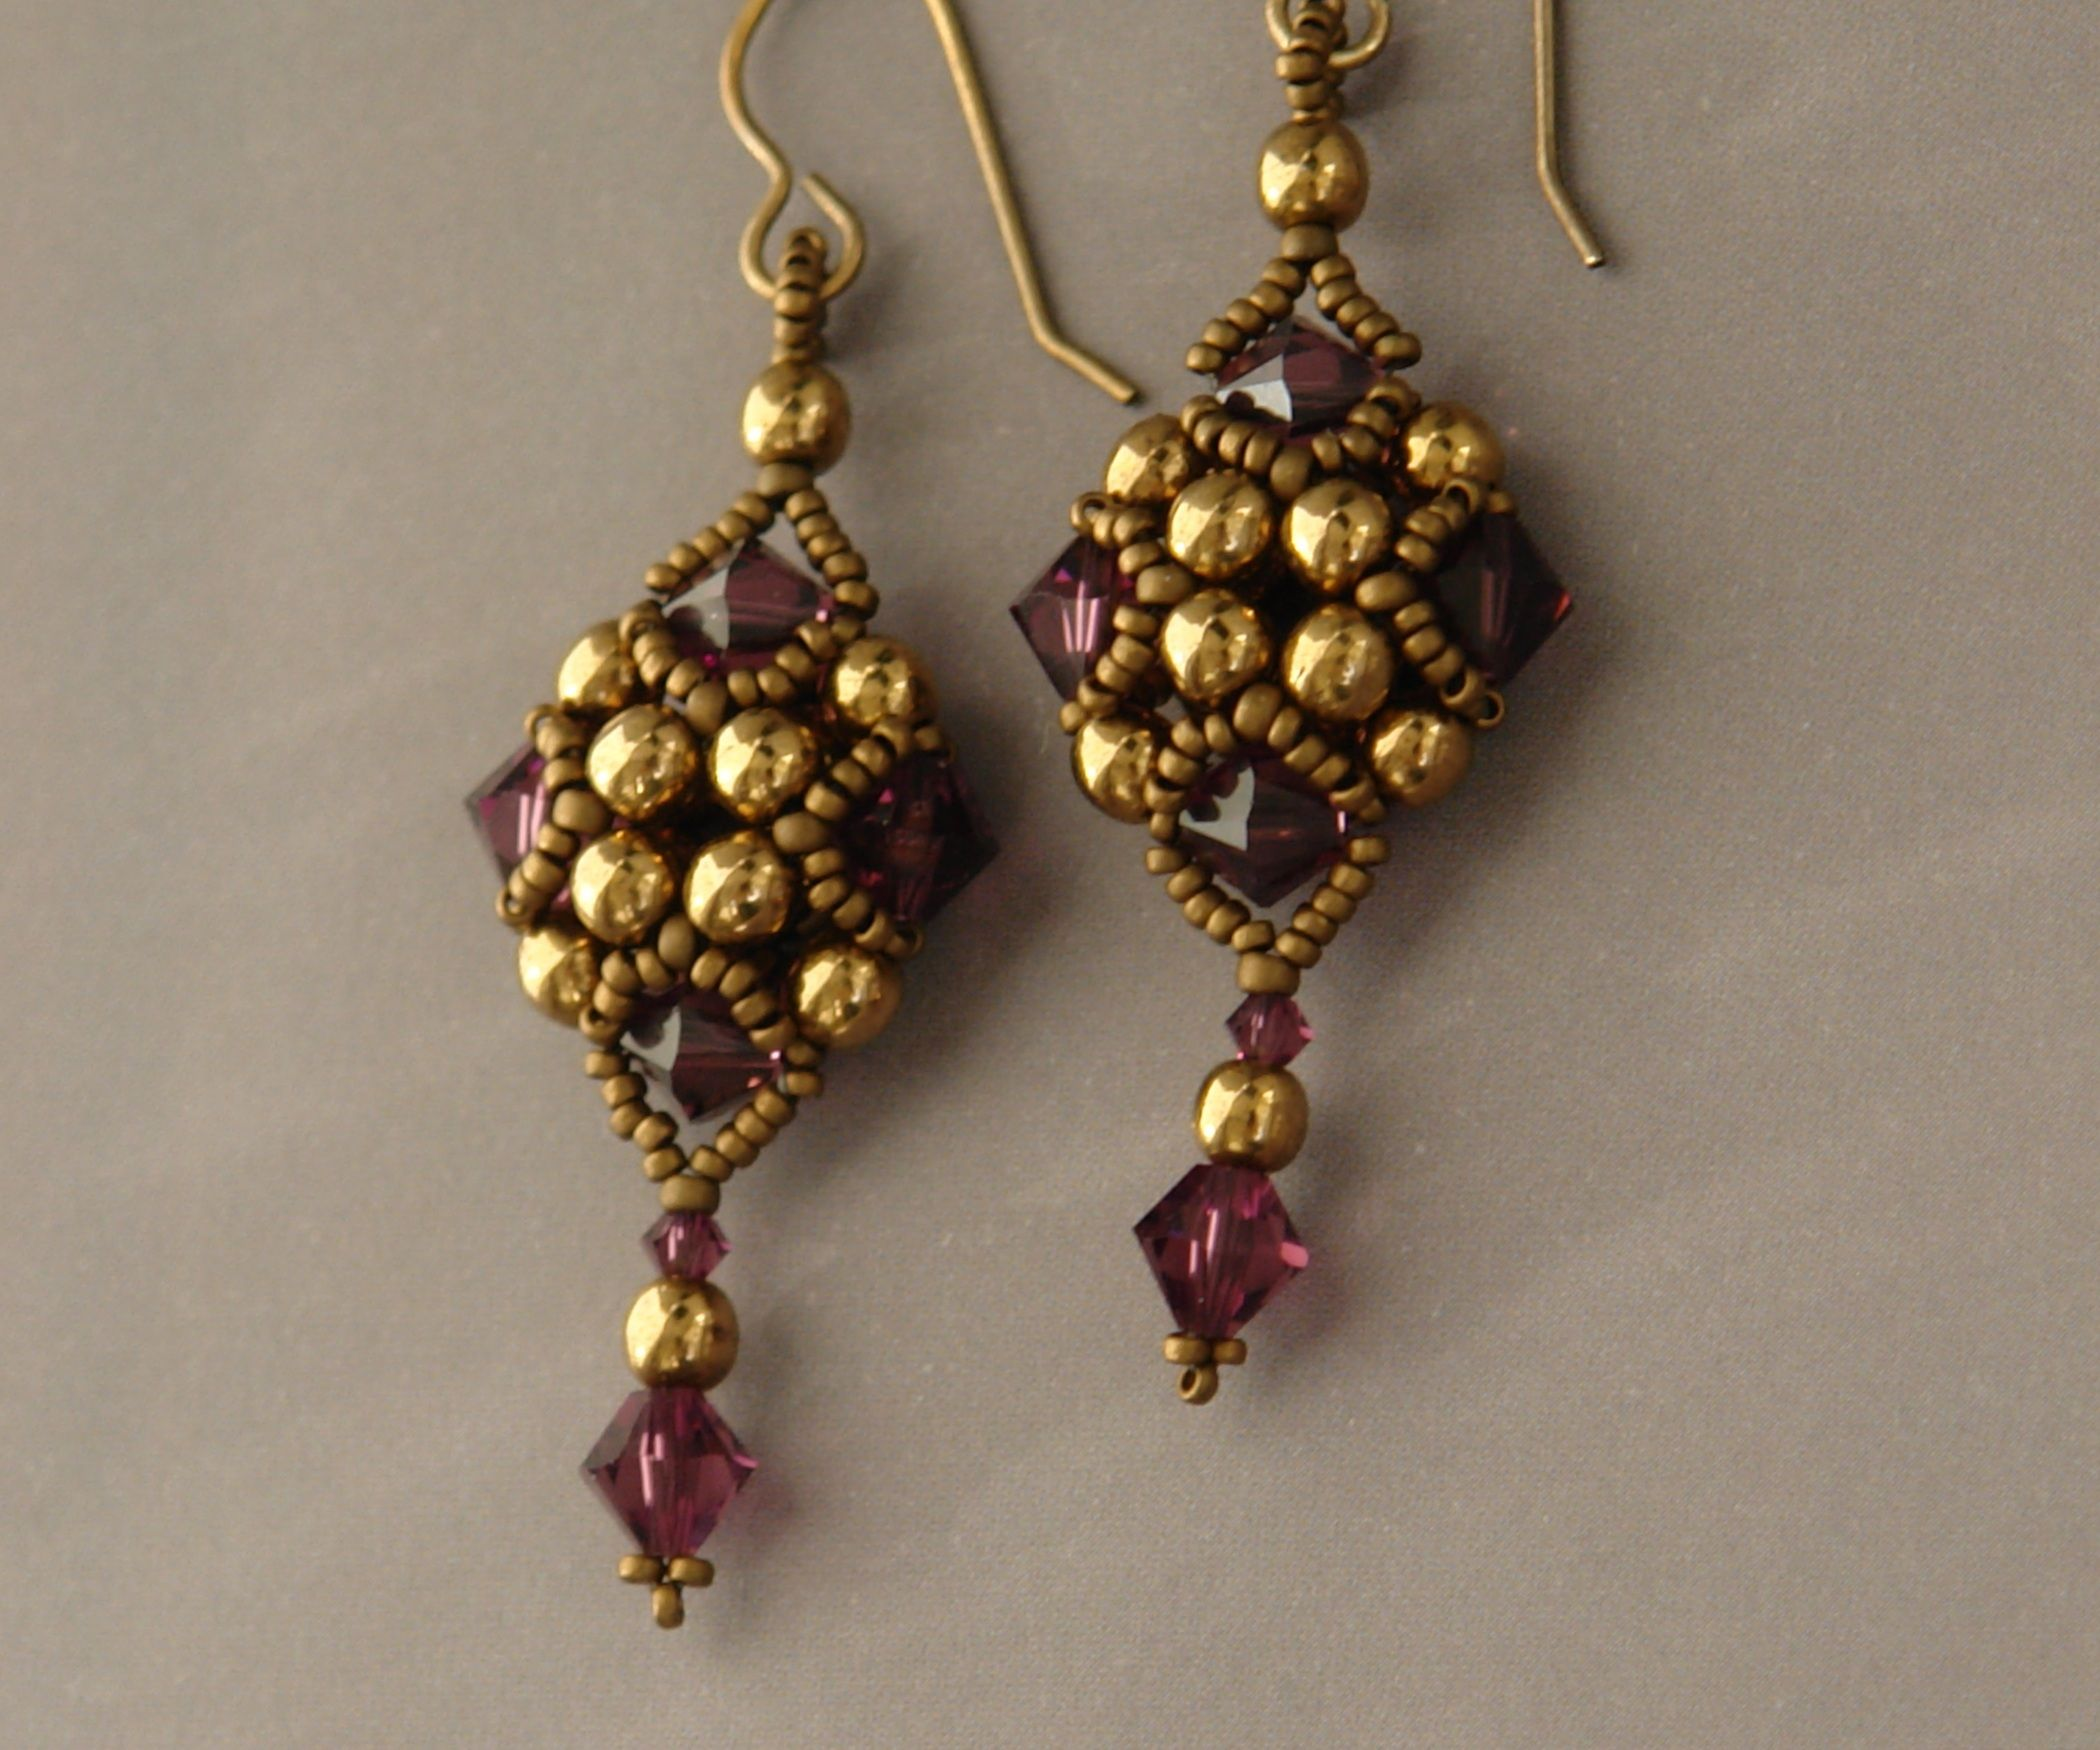 Sidonia S Handmade Jewelry Beaded Art Deco Style Earrings